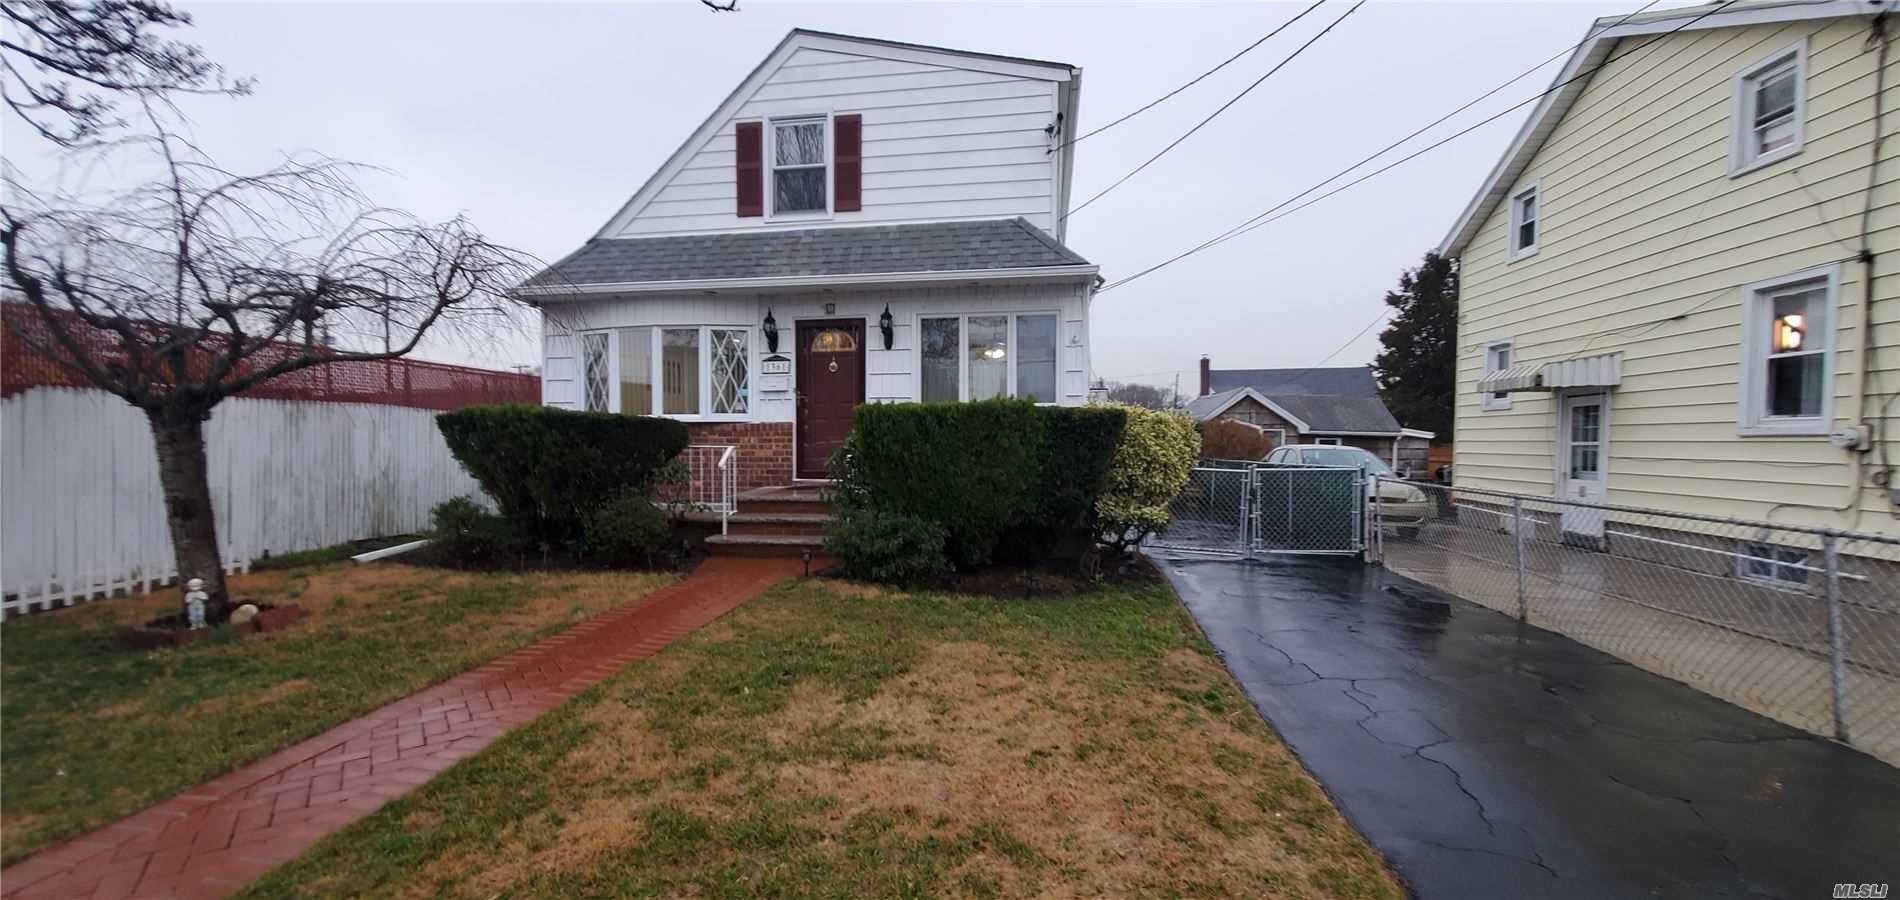 1361 Standard Avenue, Elmont, NY 11003 - MLS#: 3201677